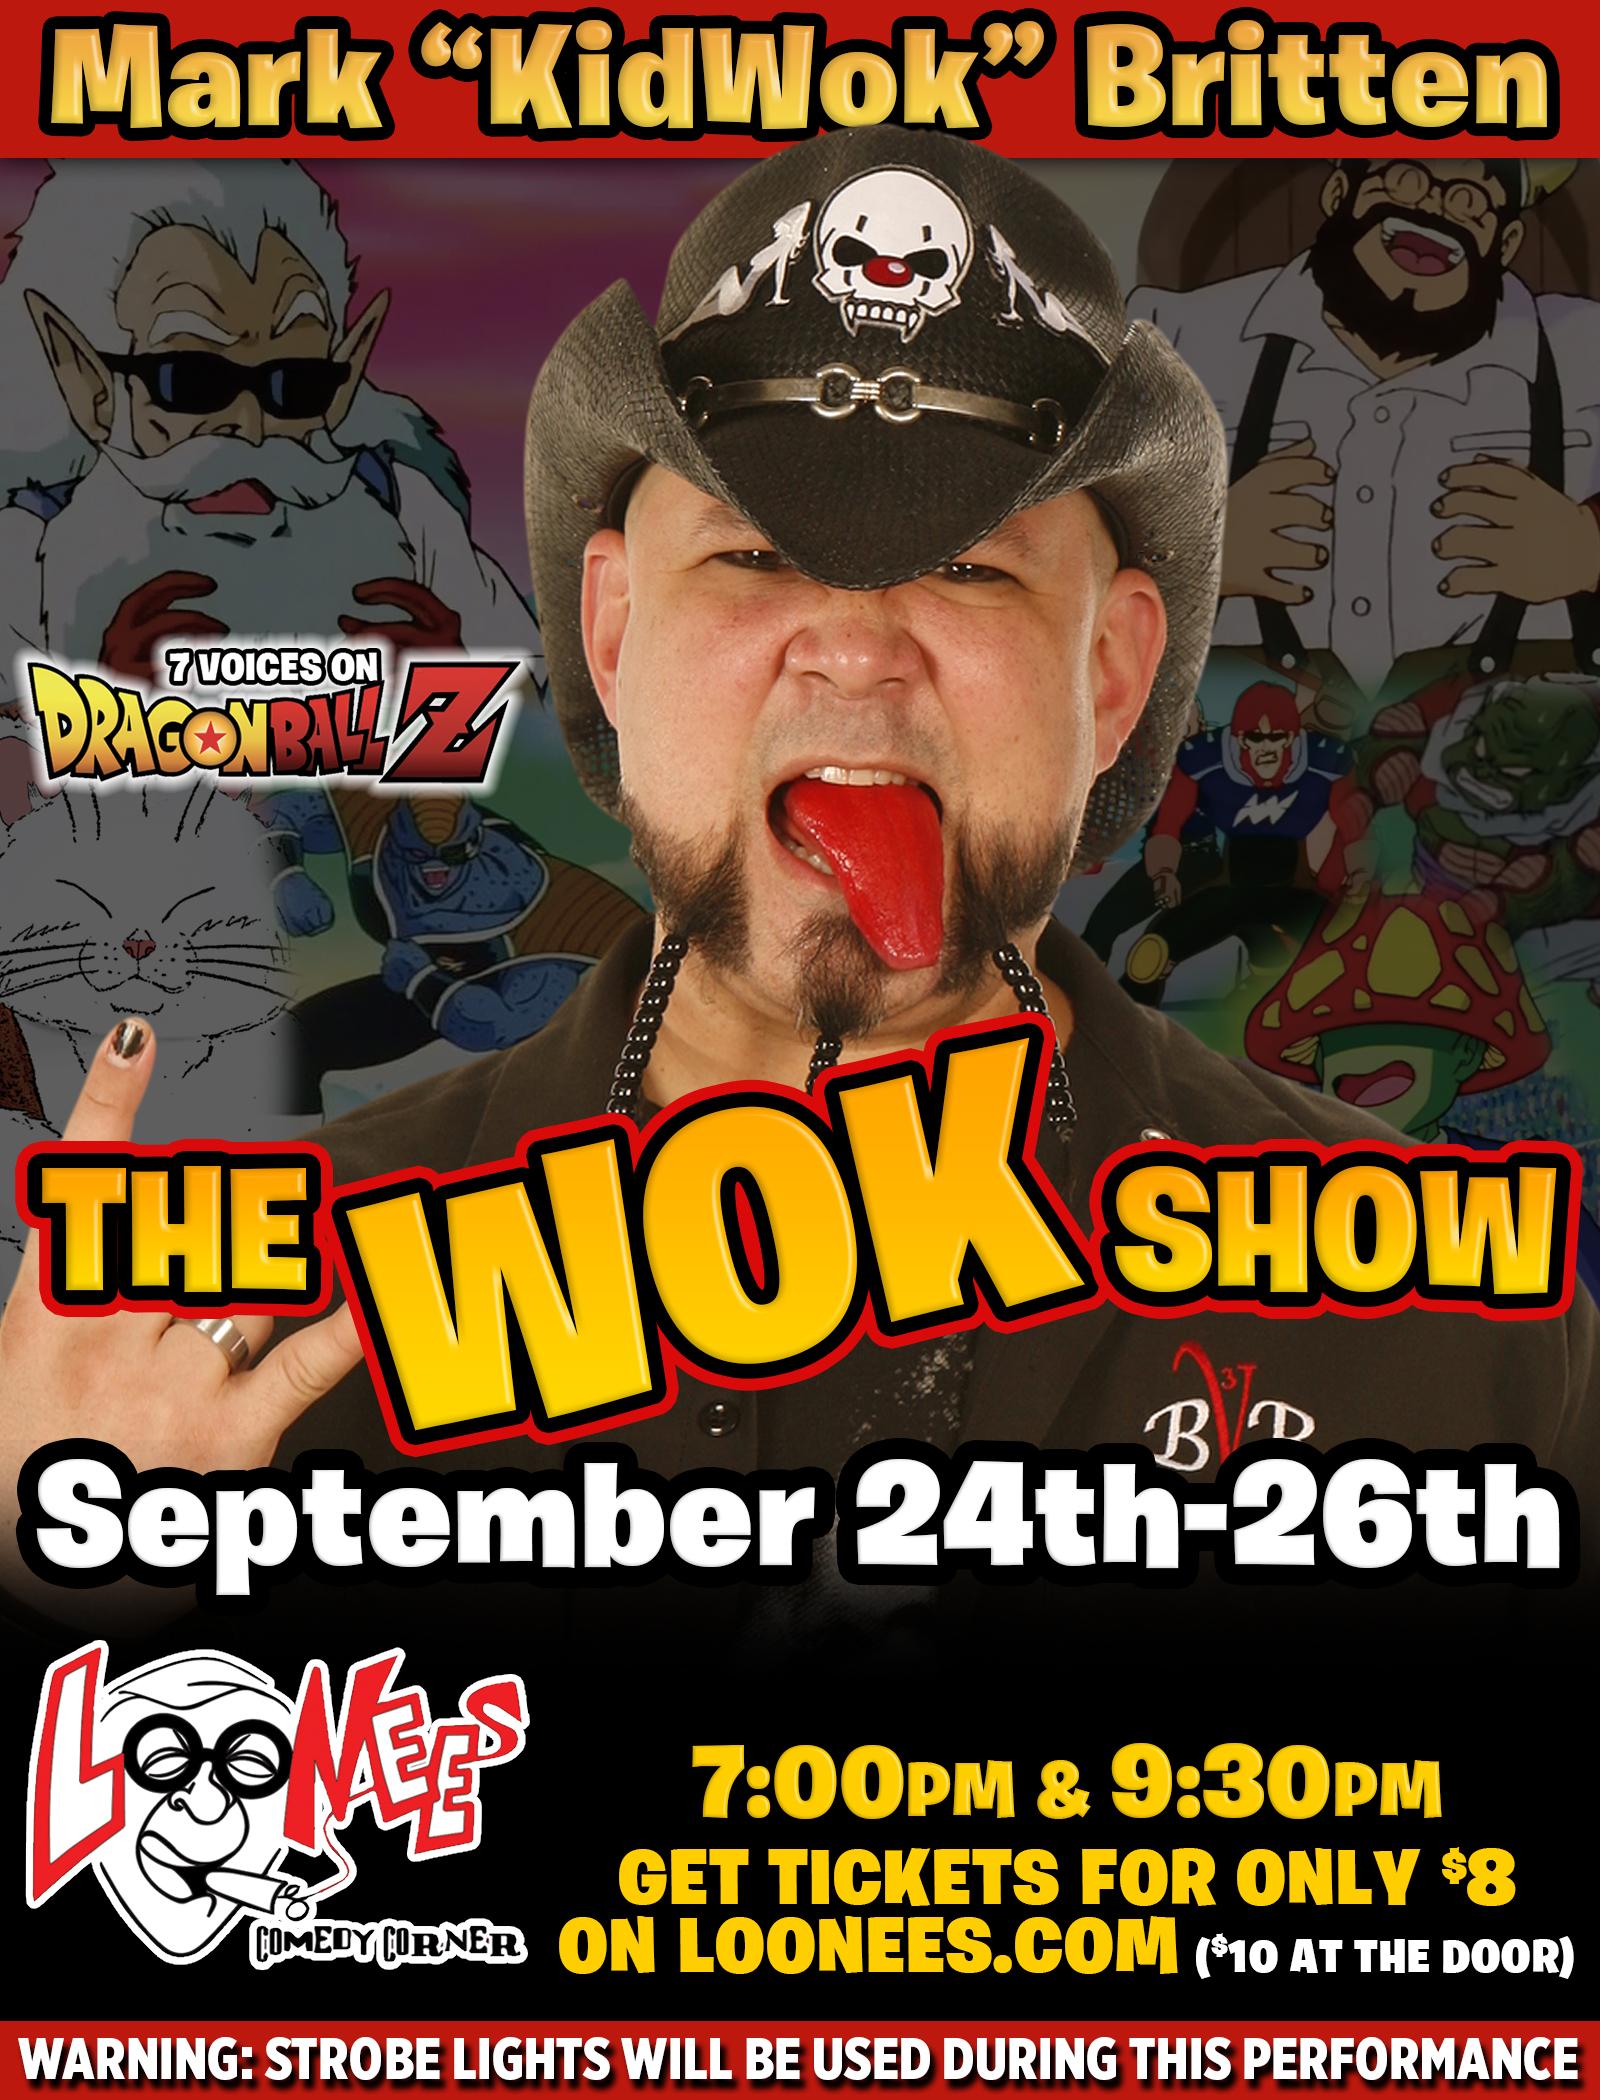 The Wok Show!